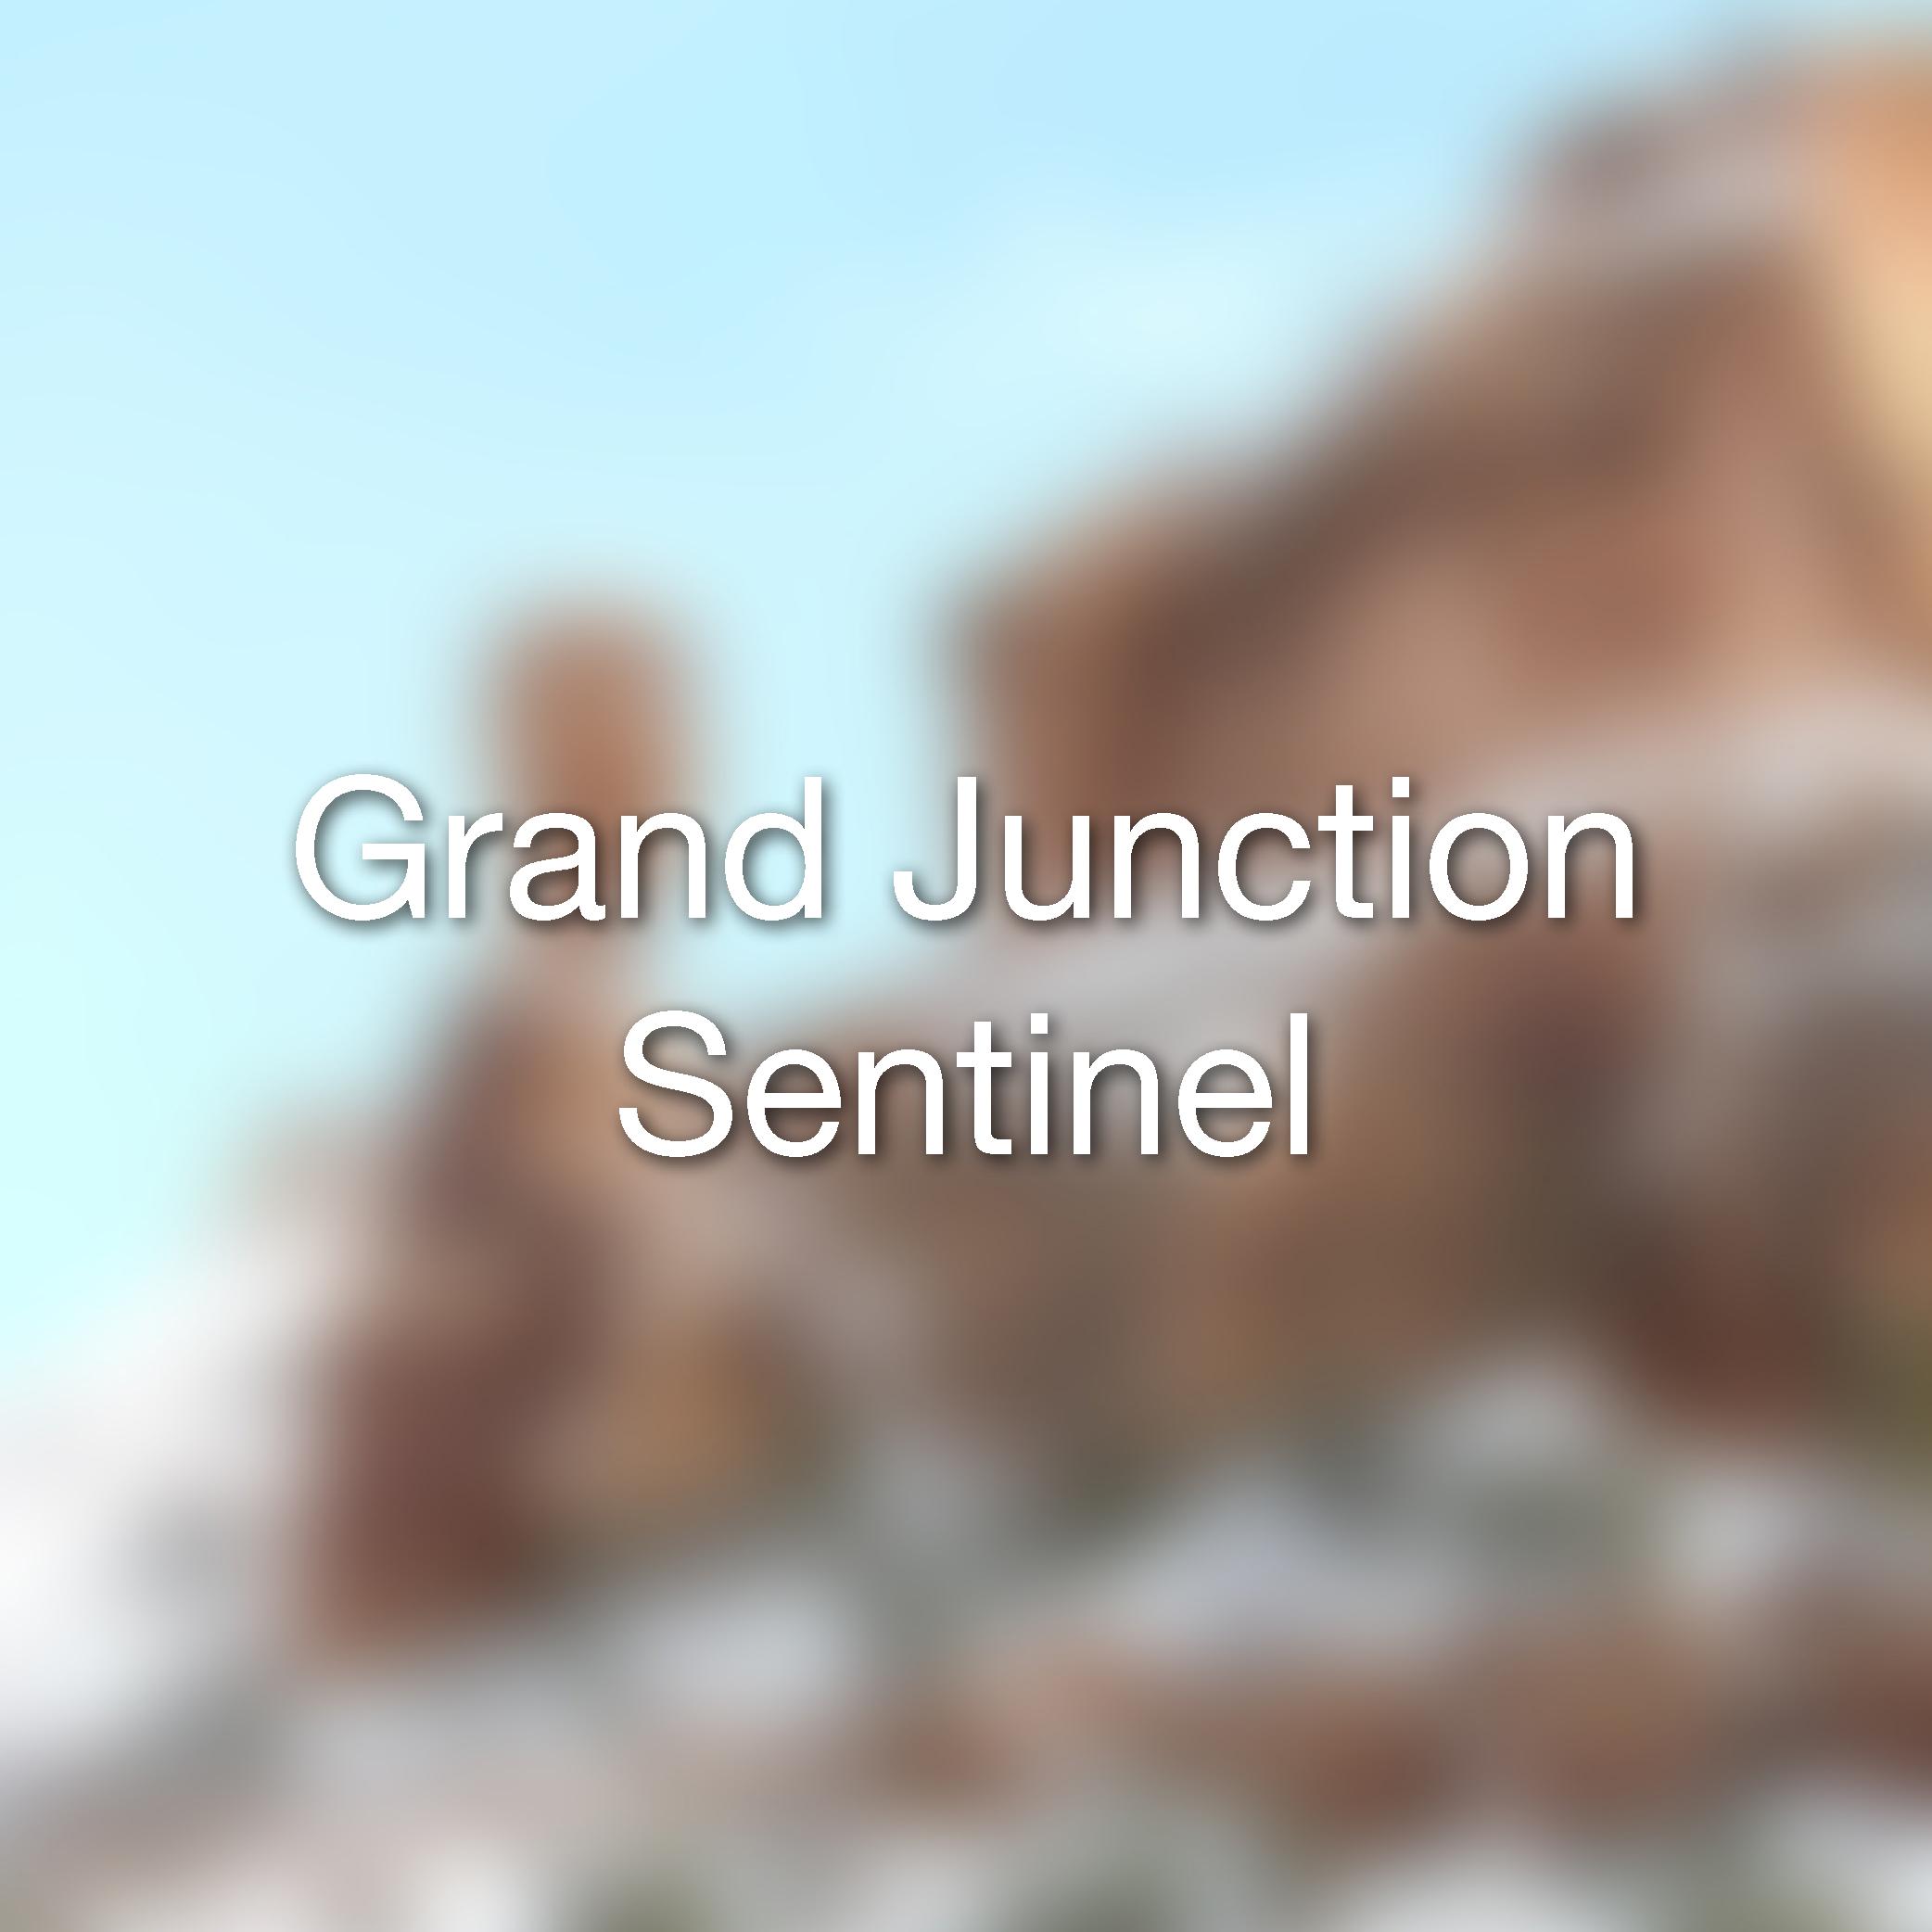 Grand Junction Sentinel